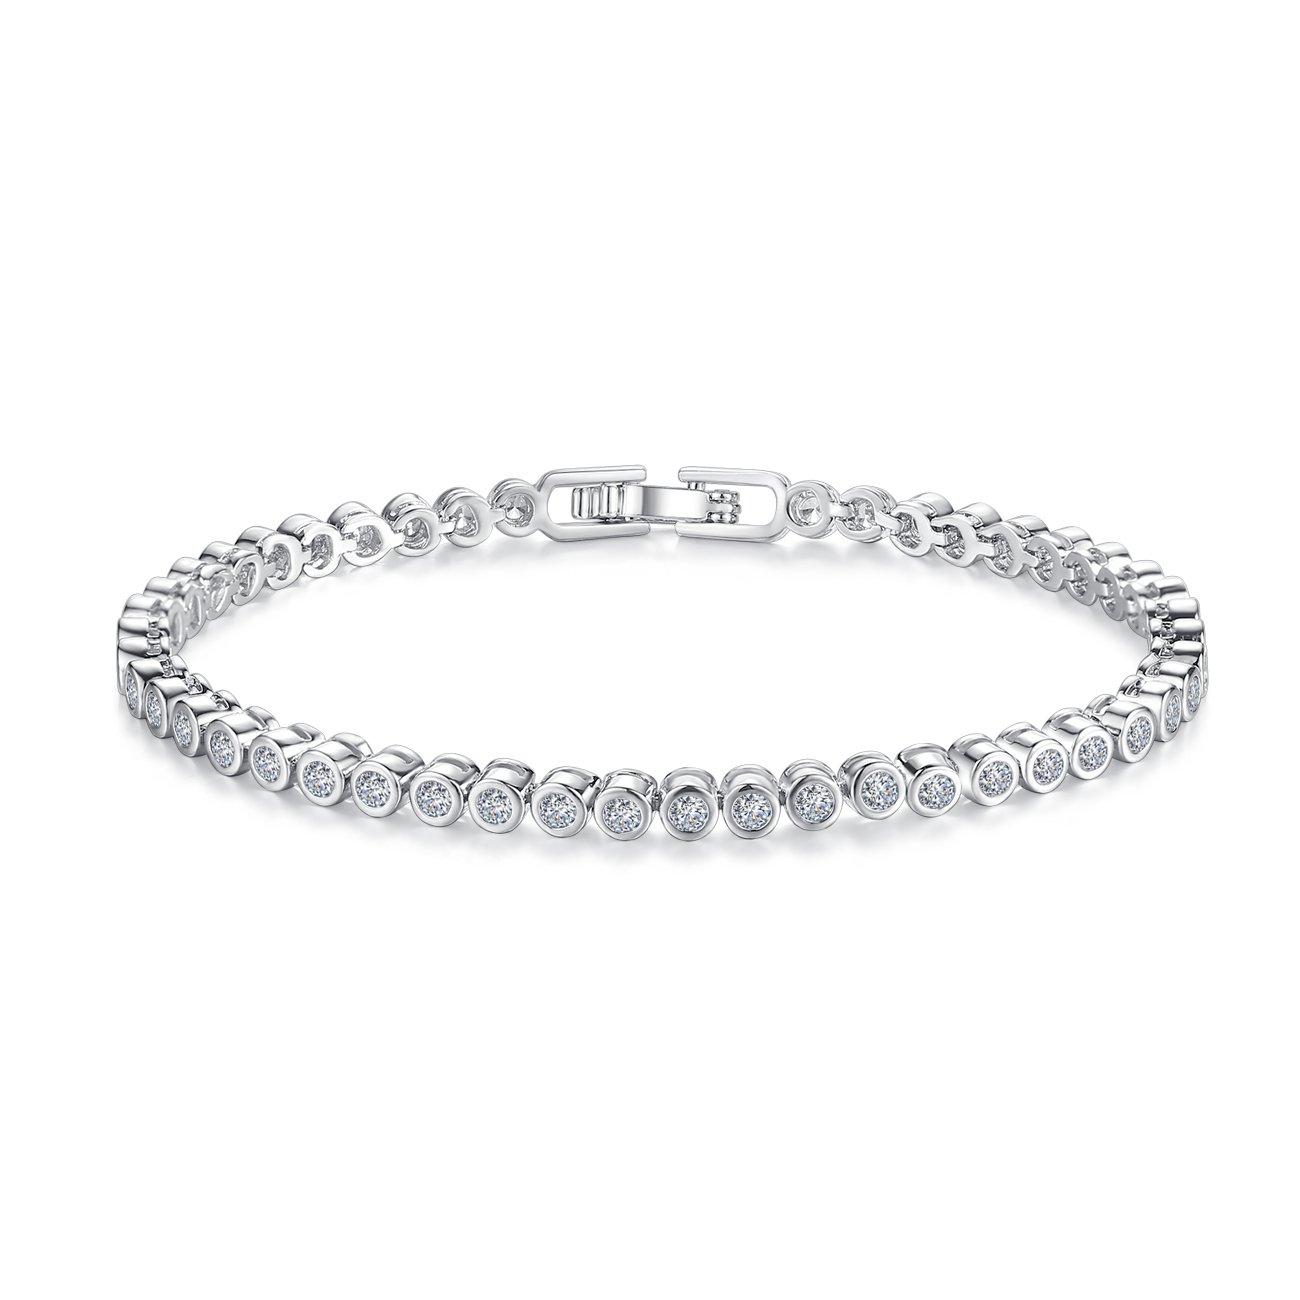 CZ Tennis Bracelets For Women - 18K Rhodium Plated Round Cut Women Jewelry, (6.7 in)